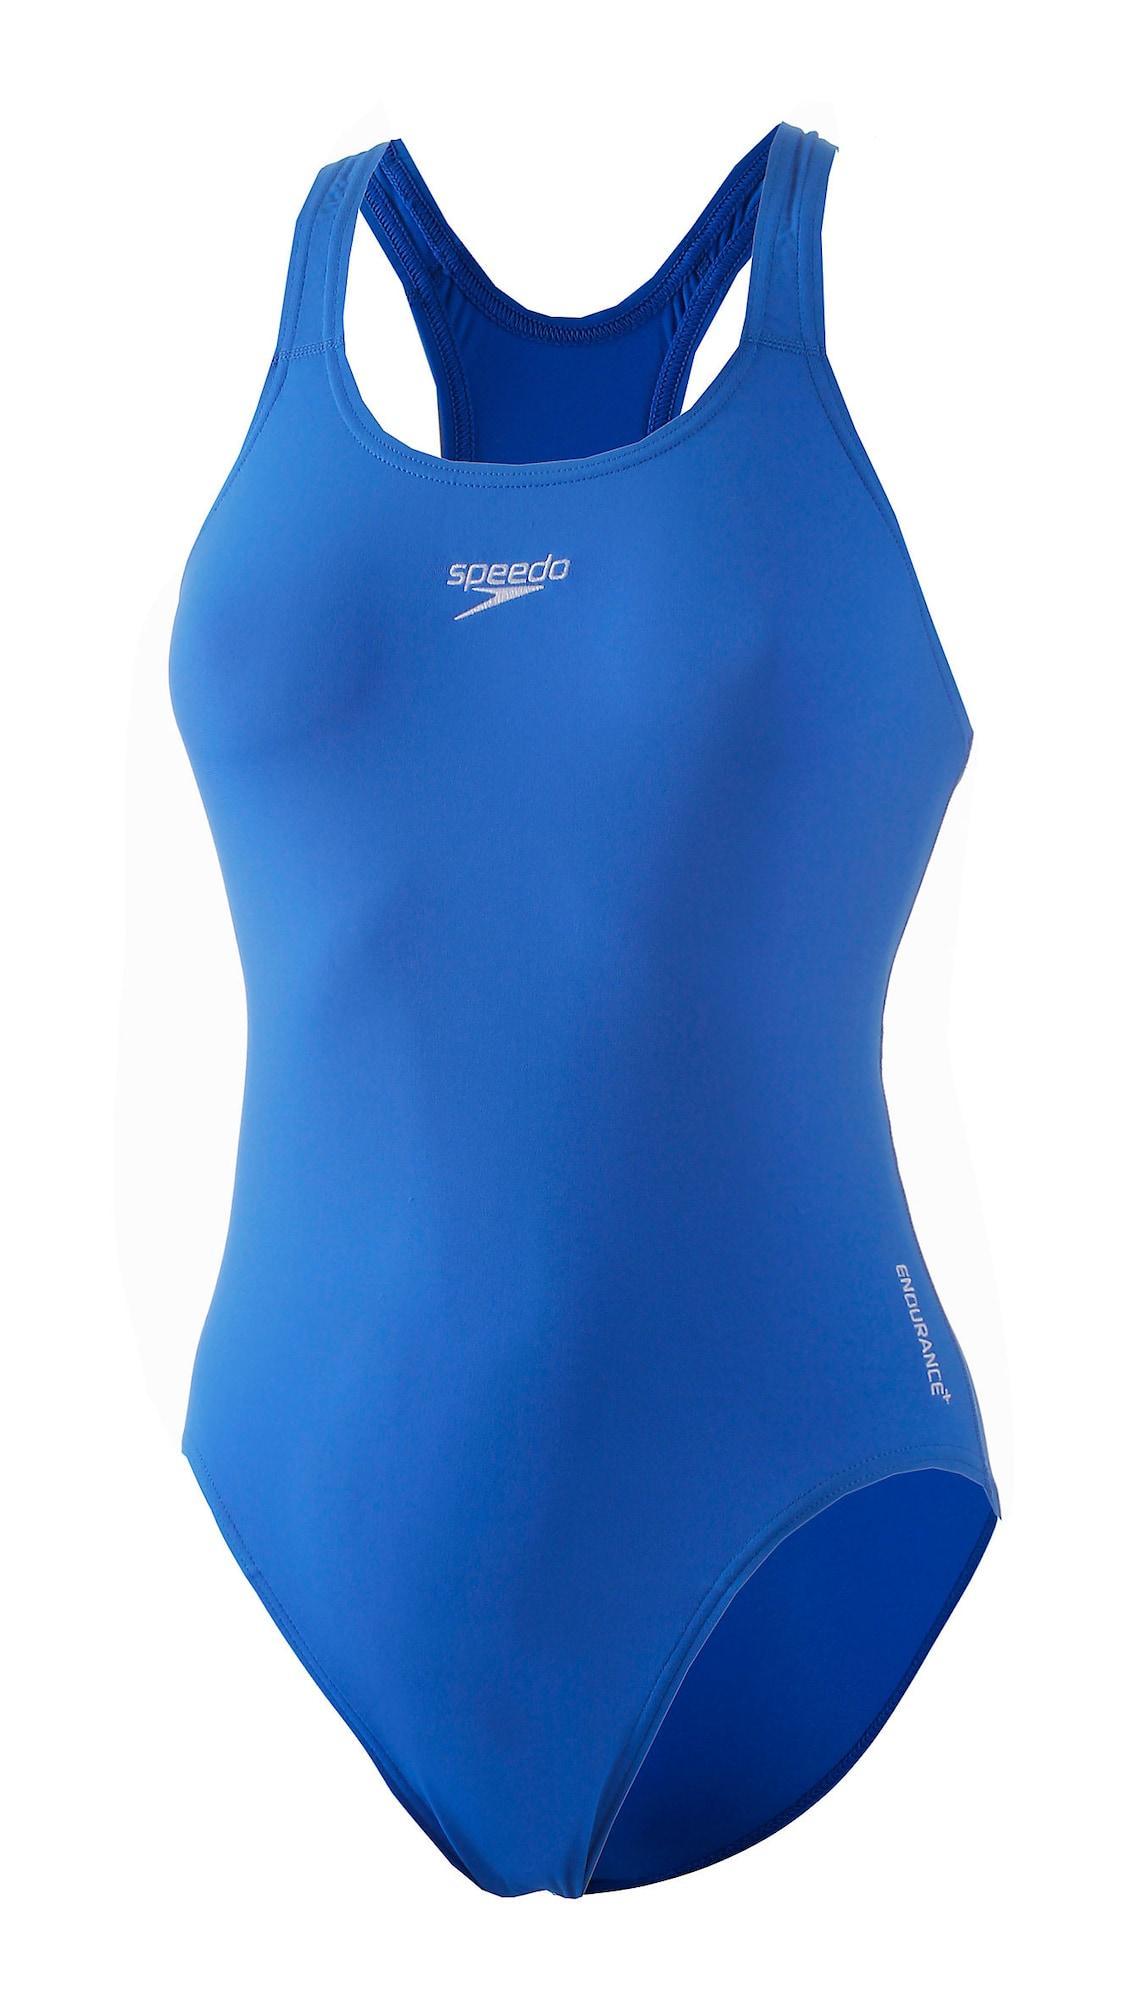 SPEEDO, Dames Sportbadpak, blauw